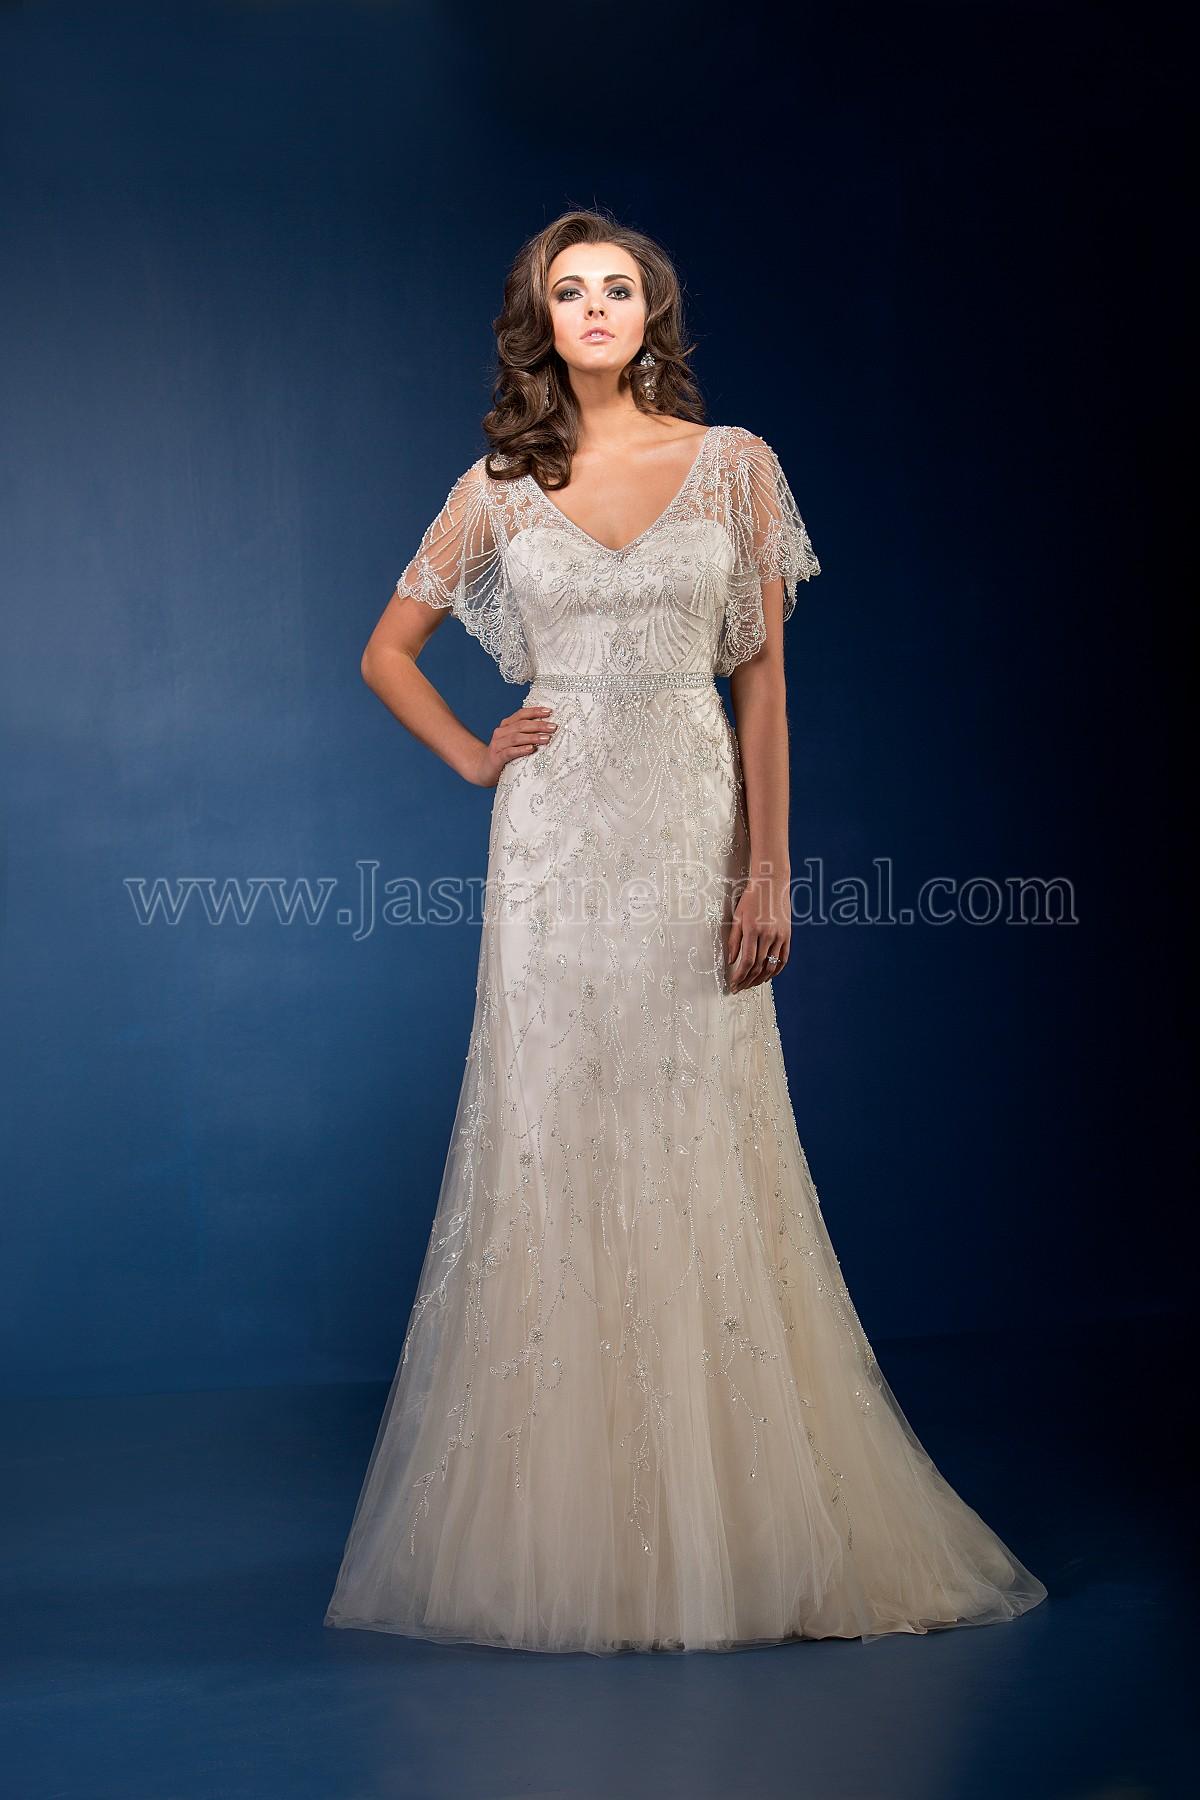 T162067 Vneck Beaded Netting Wedding Dress With Flutter Sleeves - Flutter Sleeve Wedding Dress